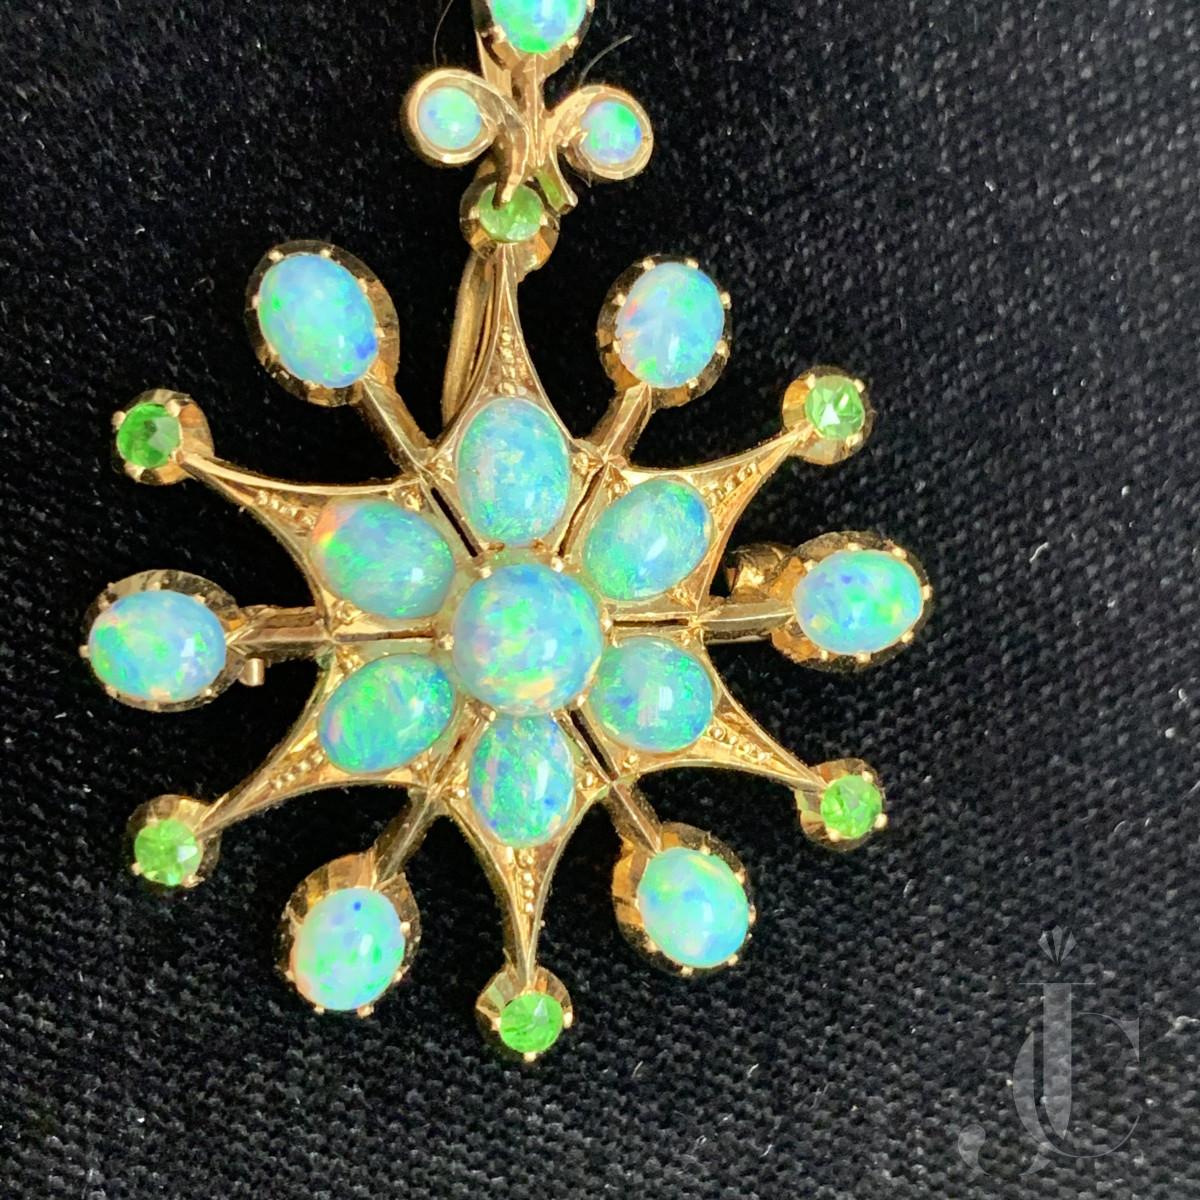 14kt YG Opal demantoid garnet pin & pendant